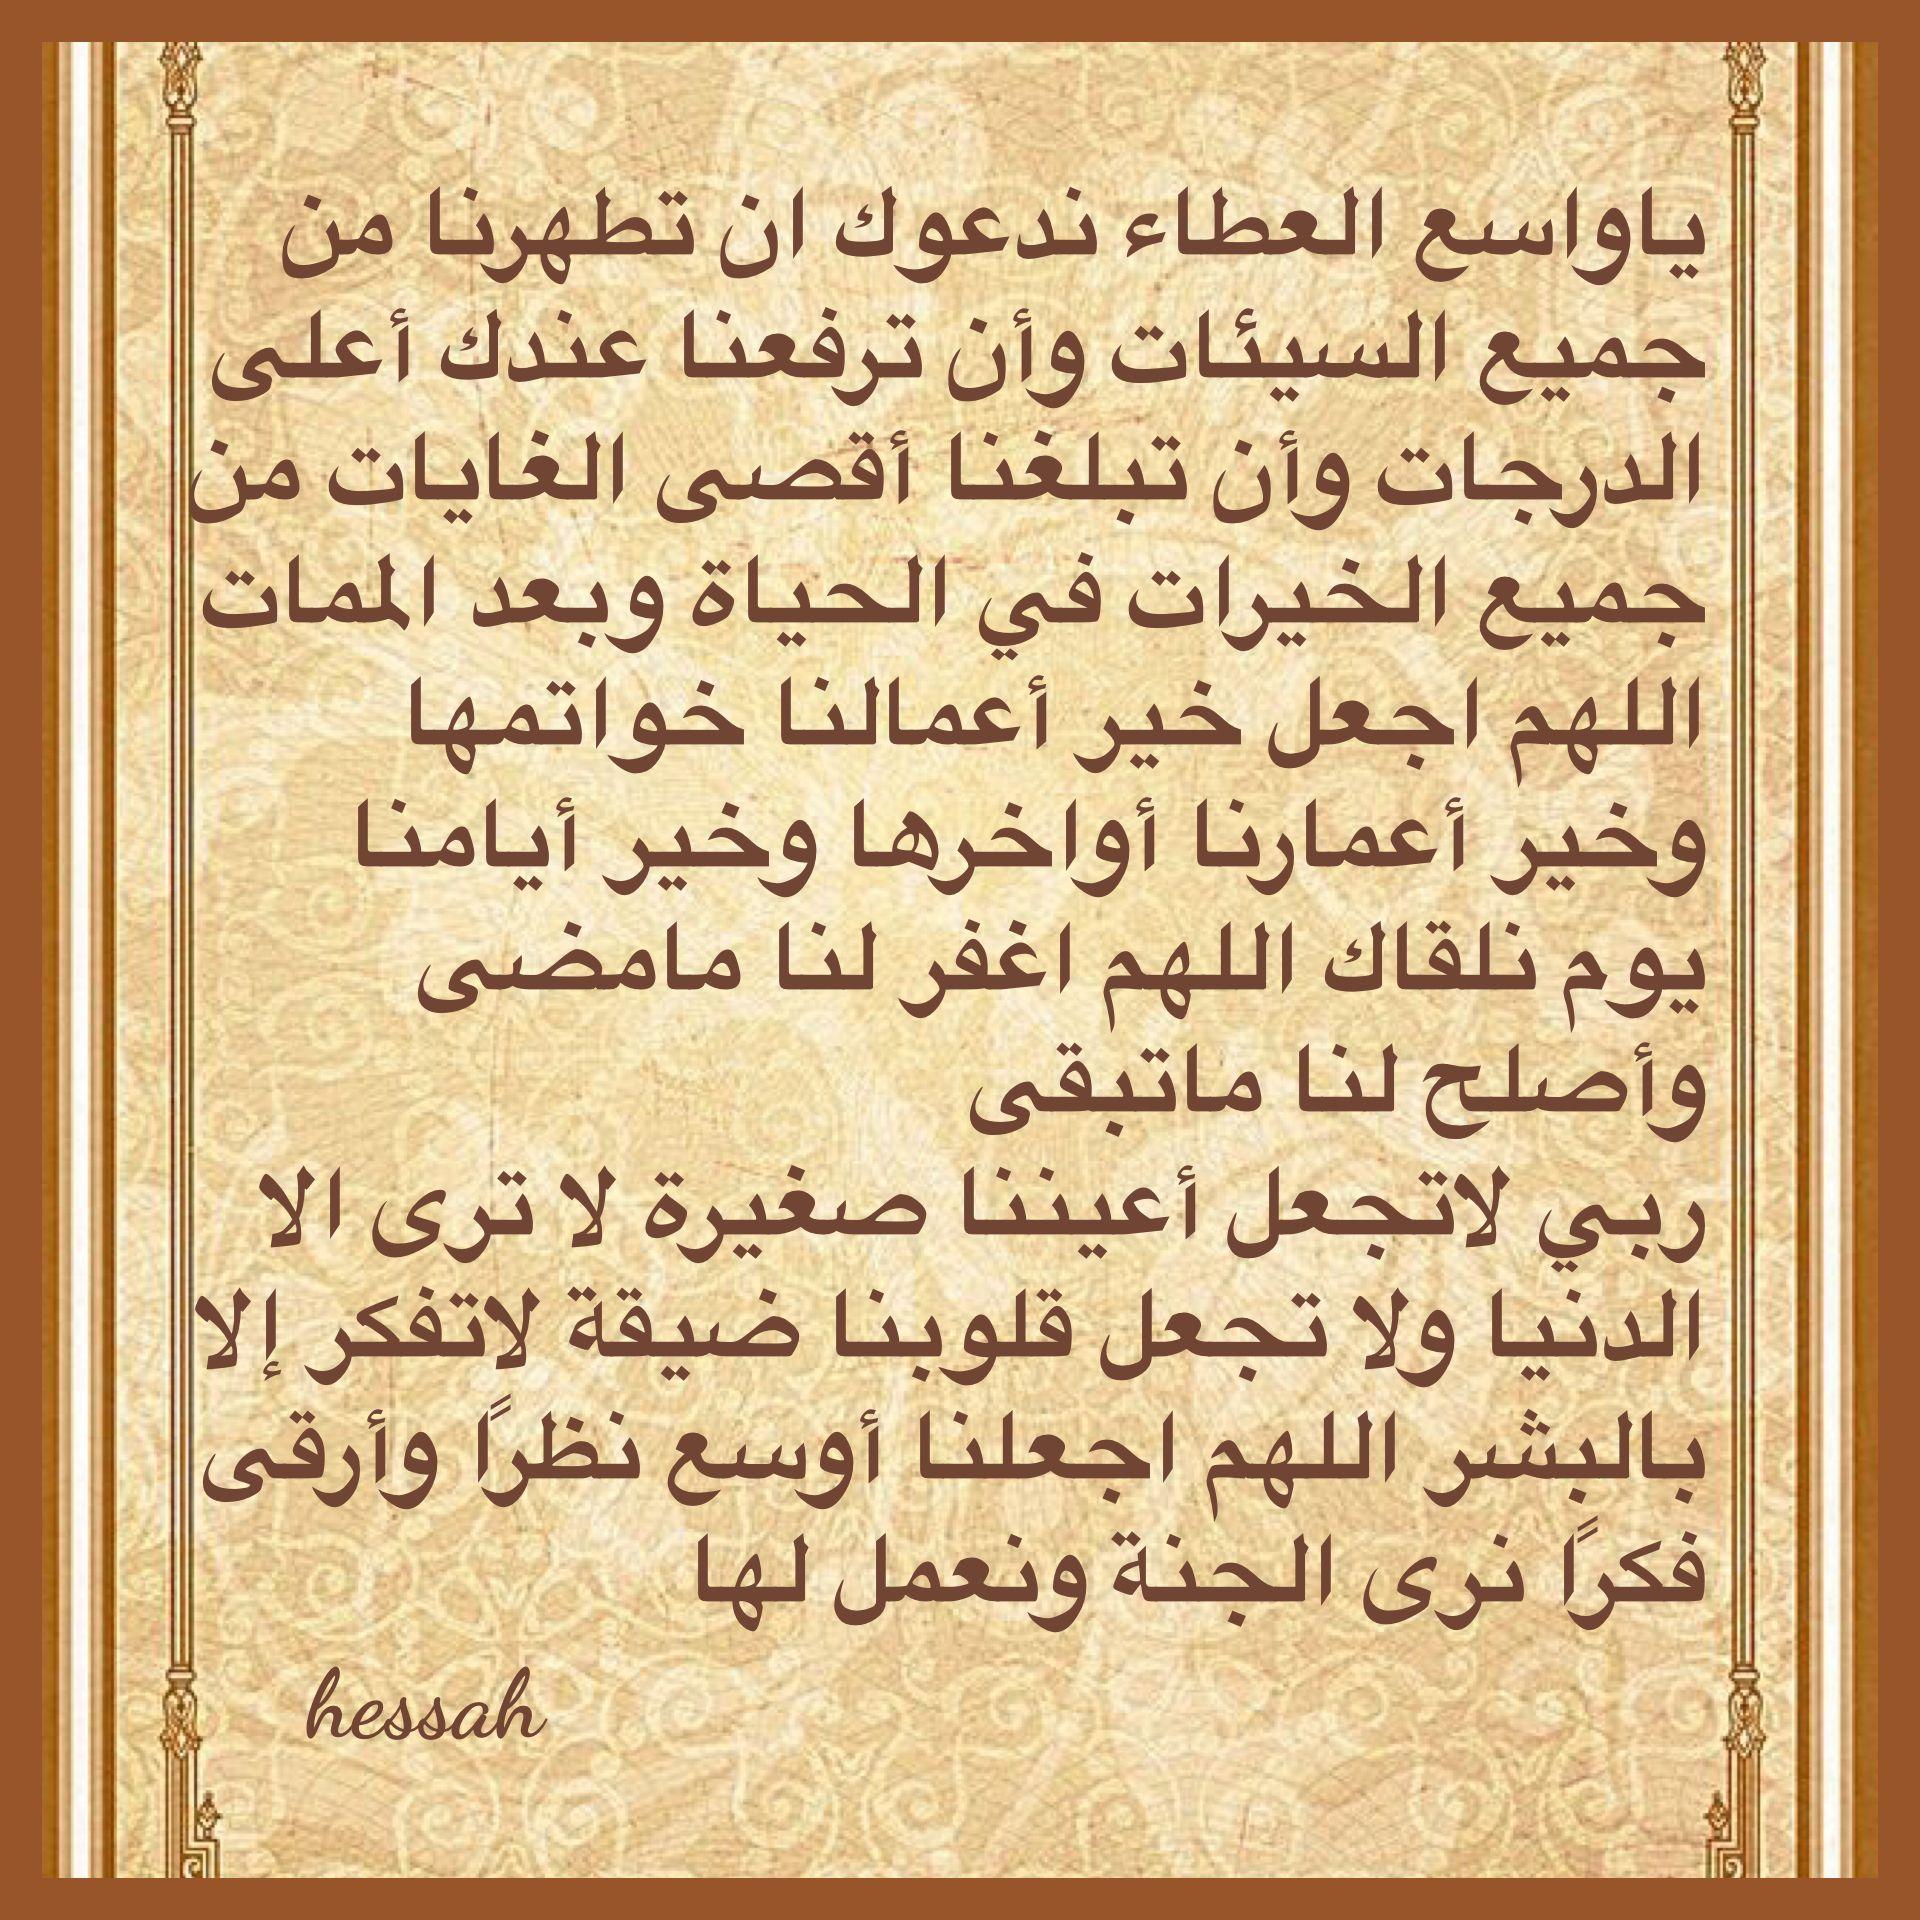 Pin By Hessah Alsudairy On يارب أدعيه وأذكار Free Books Download Free Books Pdf Download